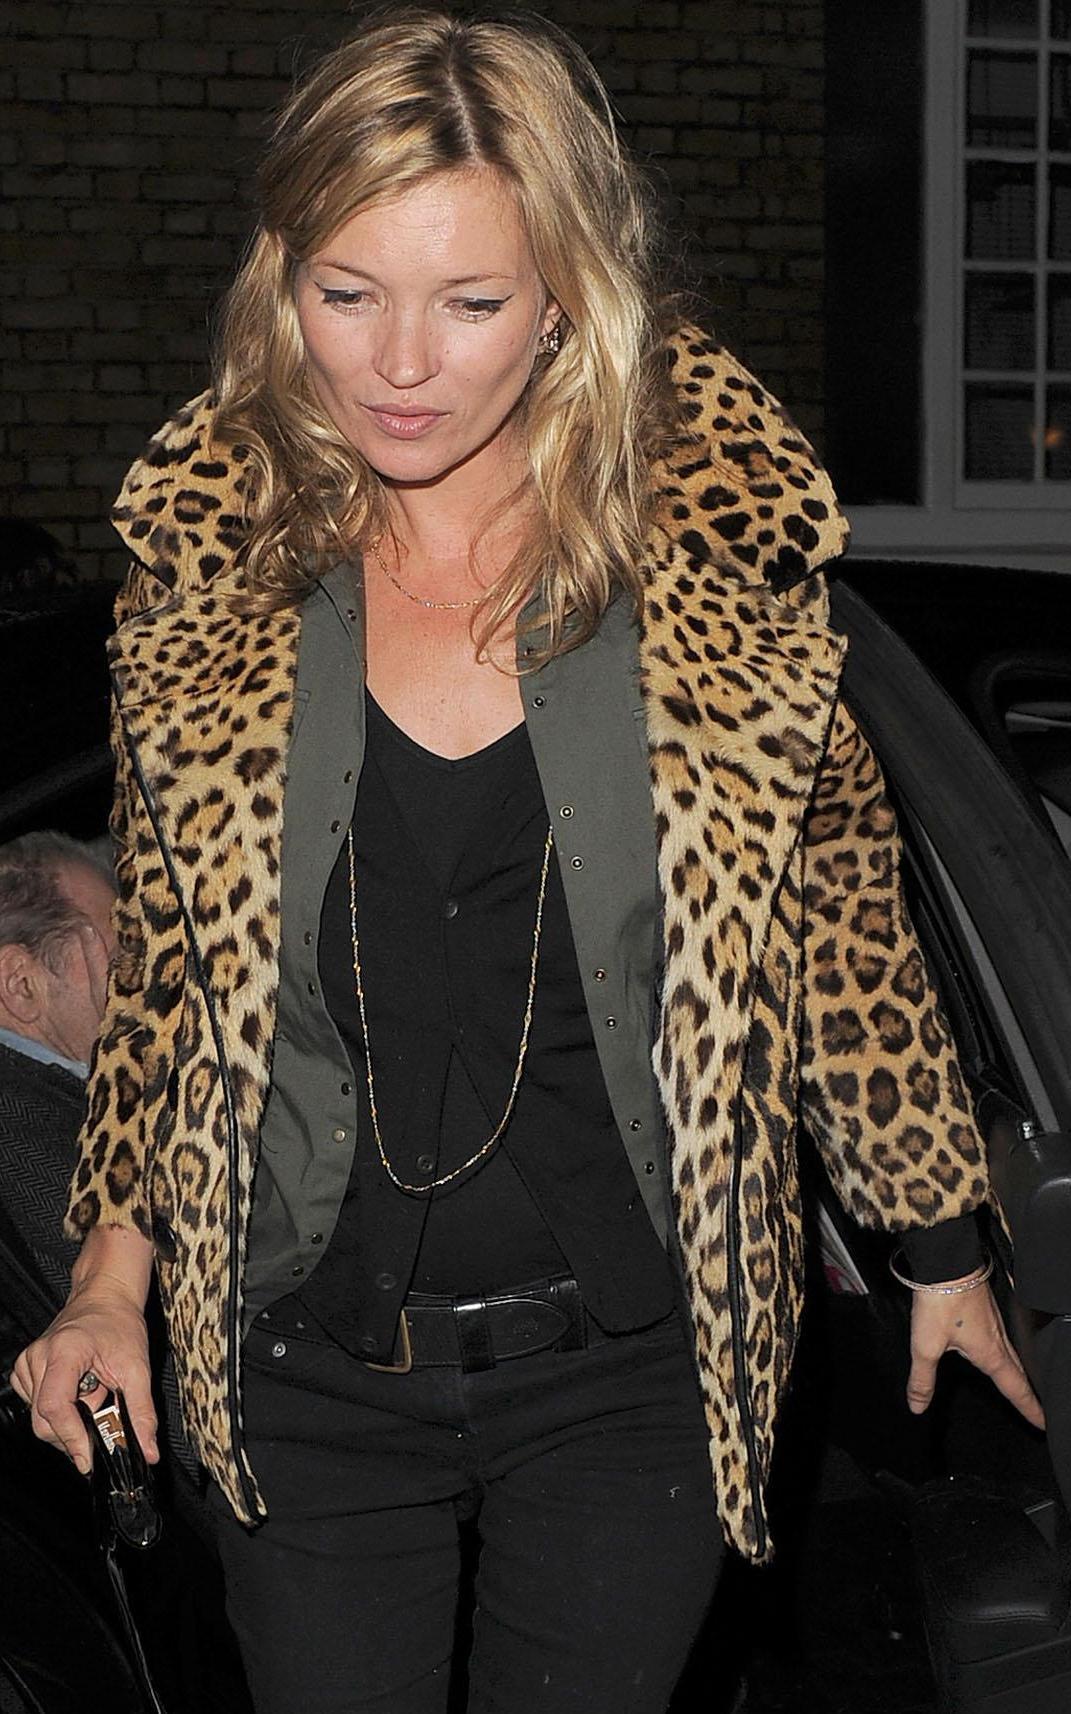 Style Spotlight: Kate Moss